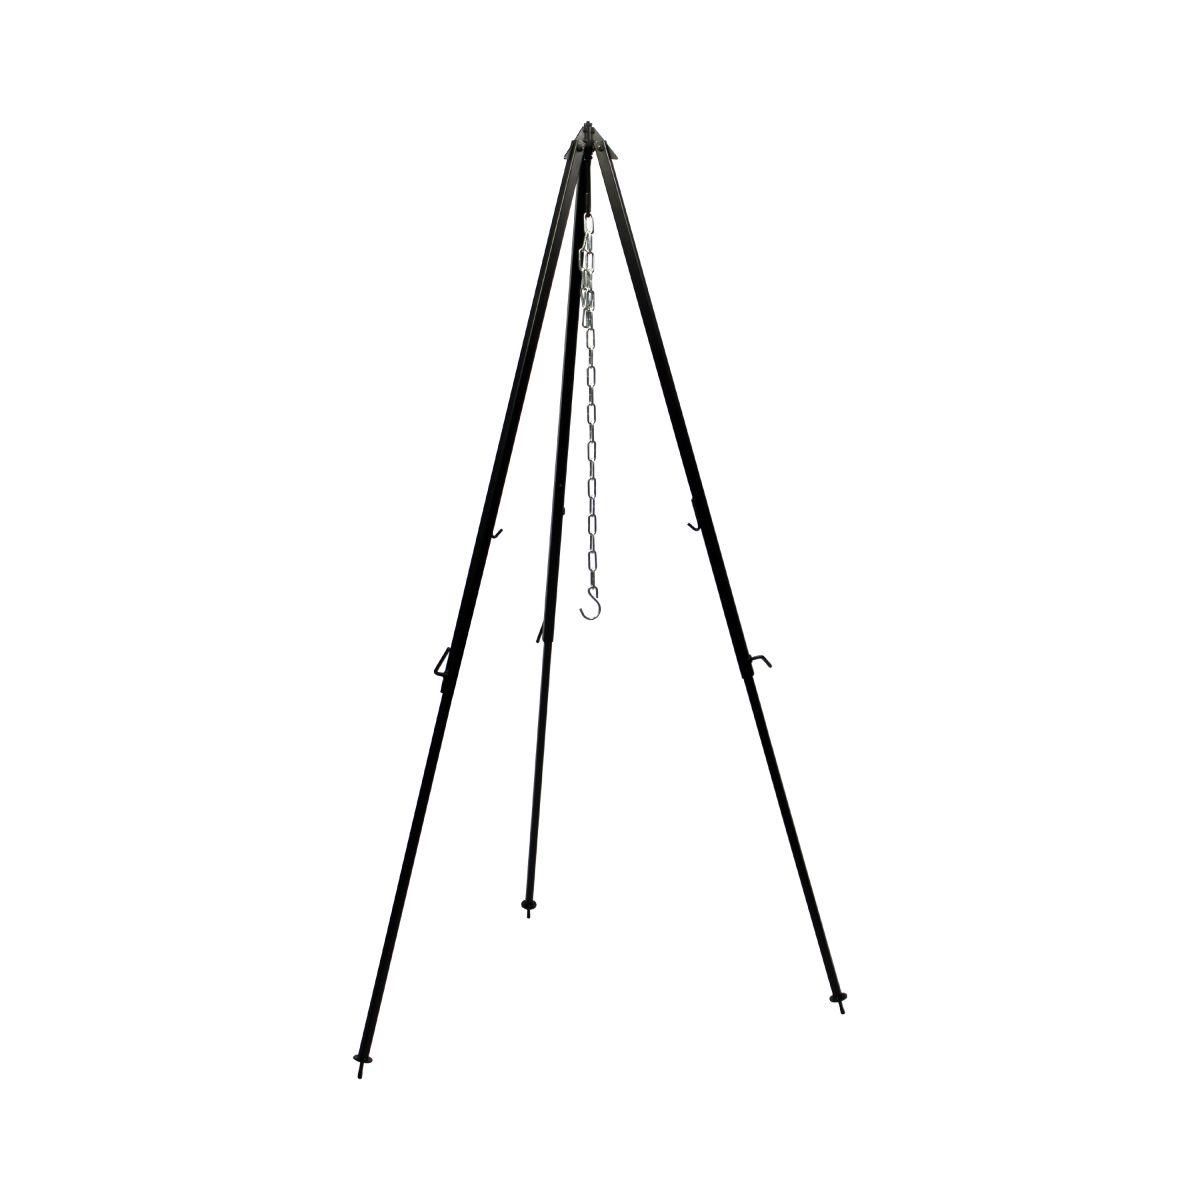 vhtripod tripod 175cm